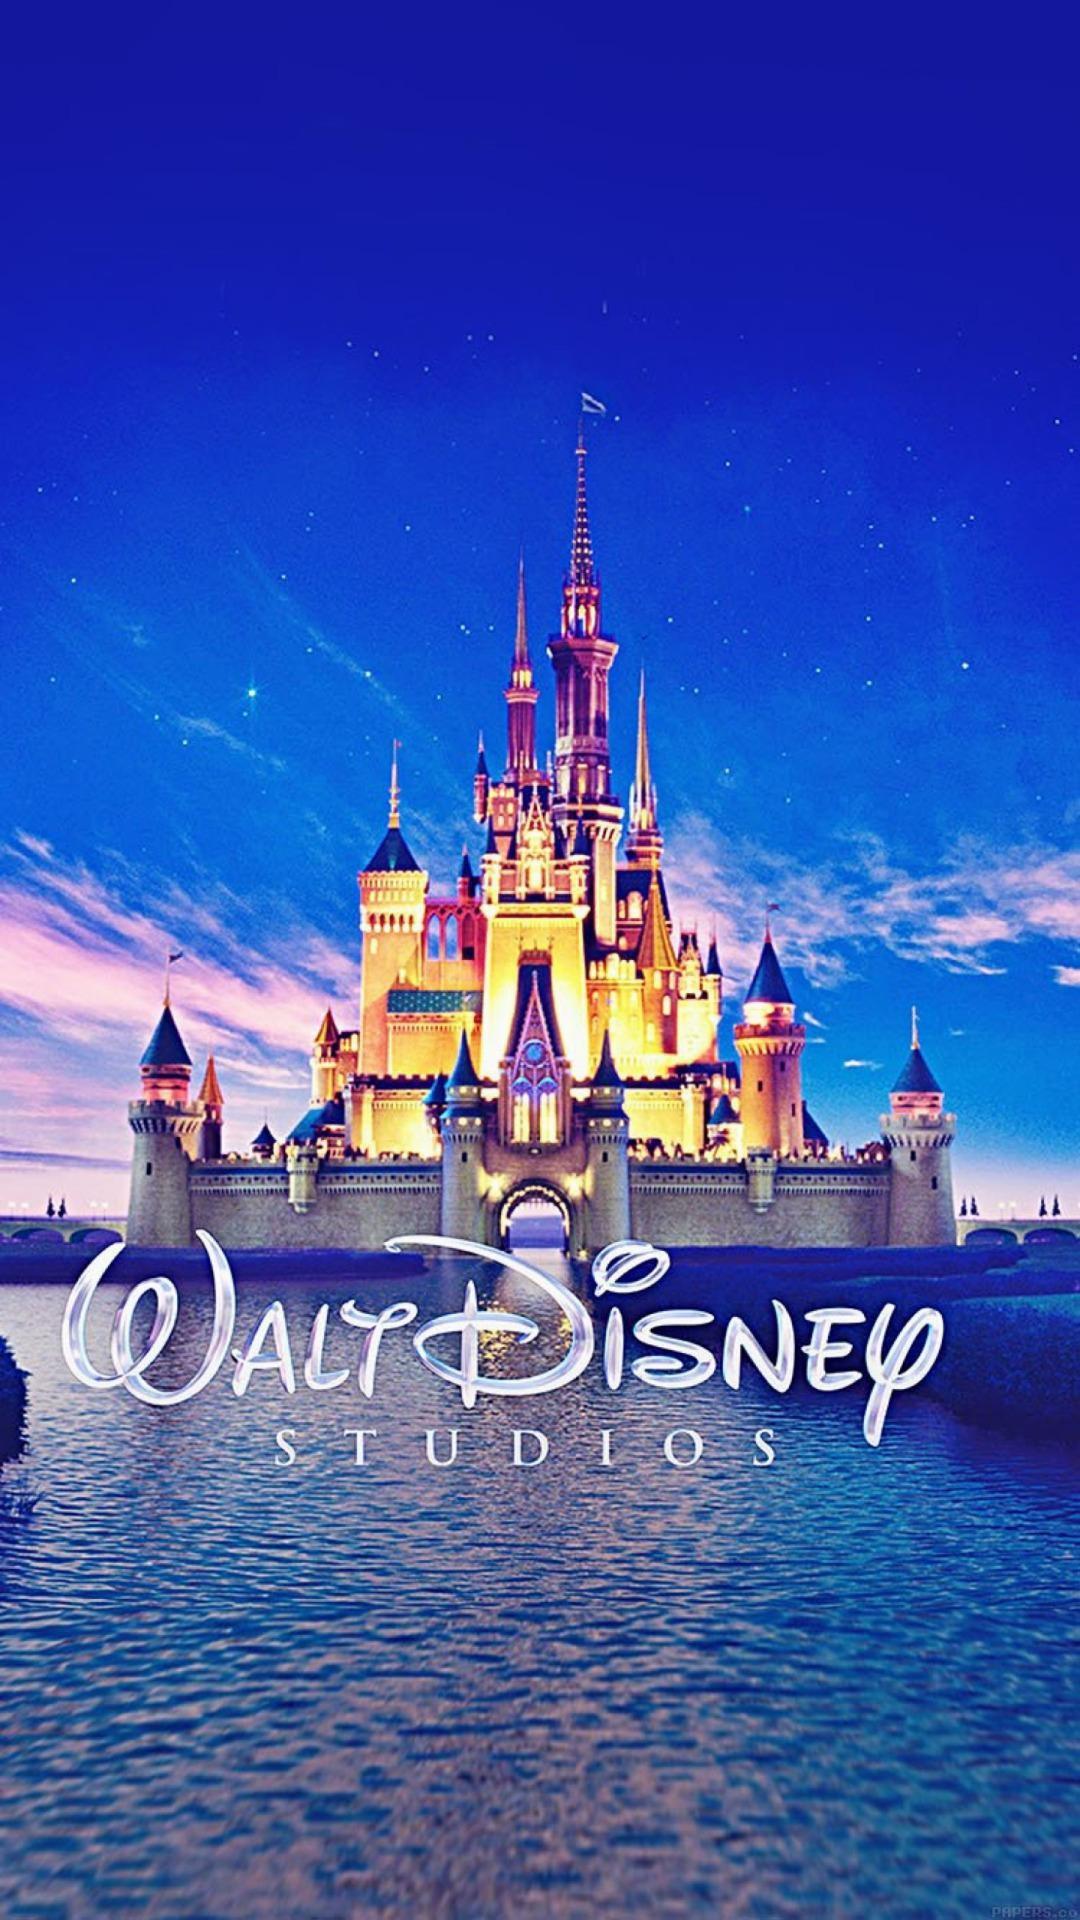 Sfondi Disney 68 Immagini